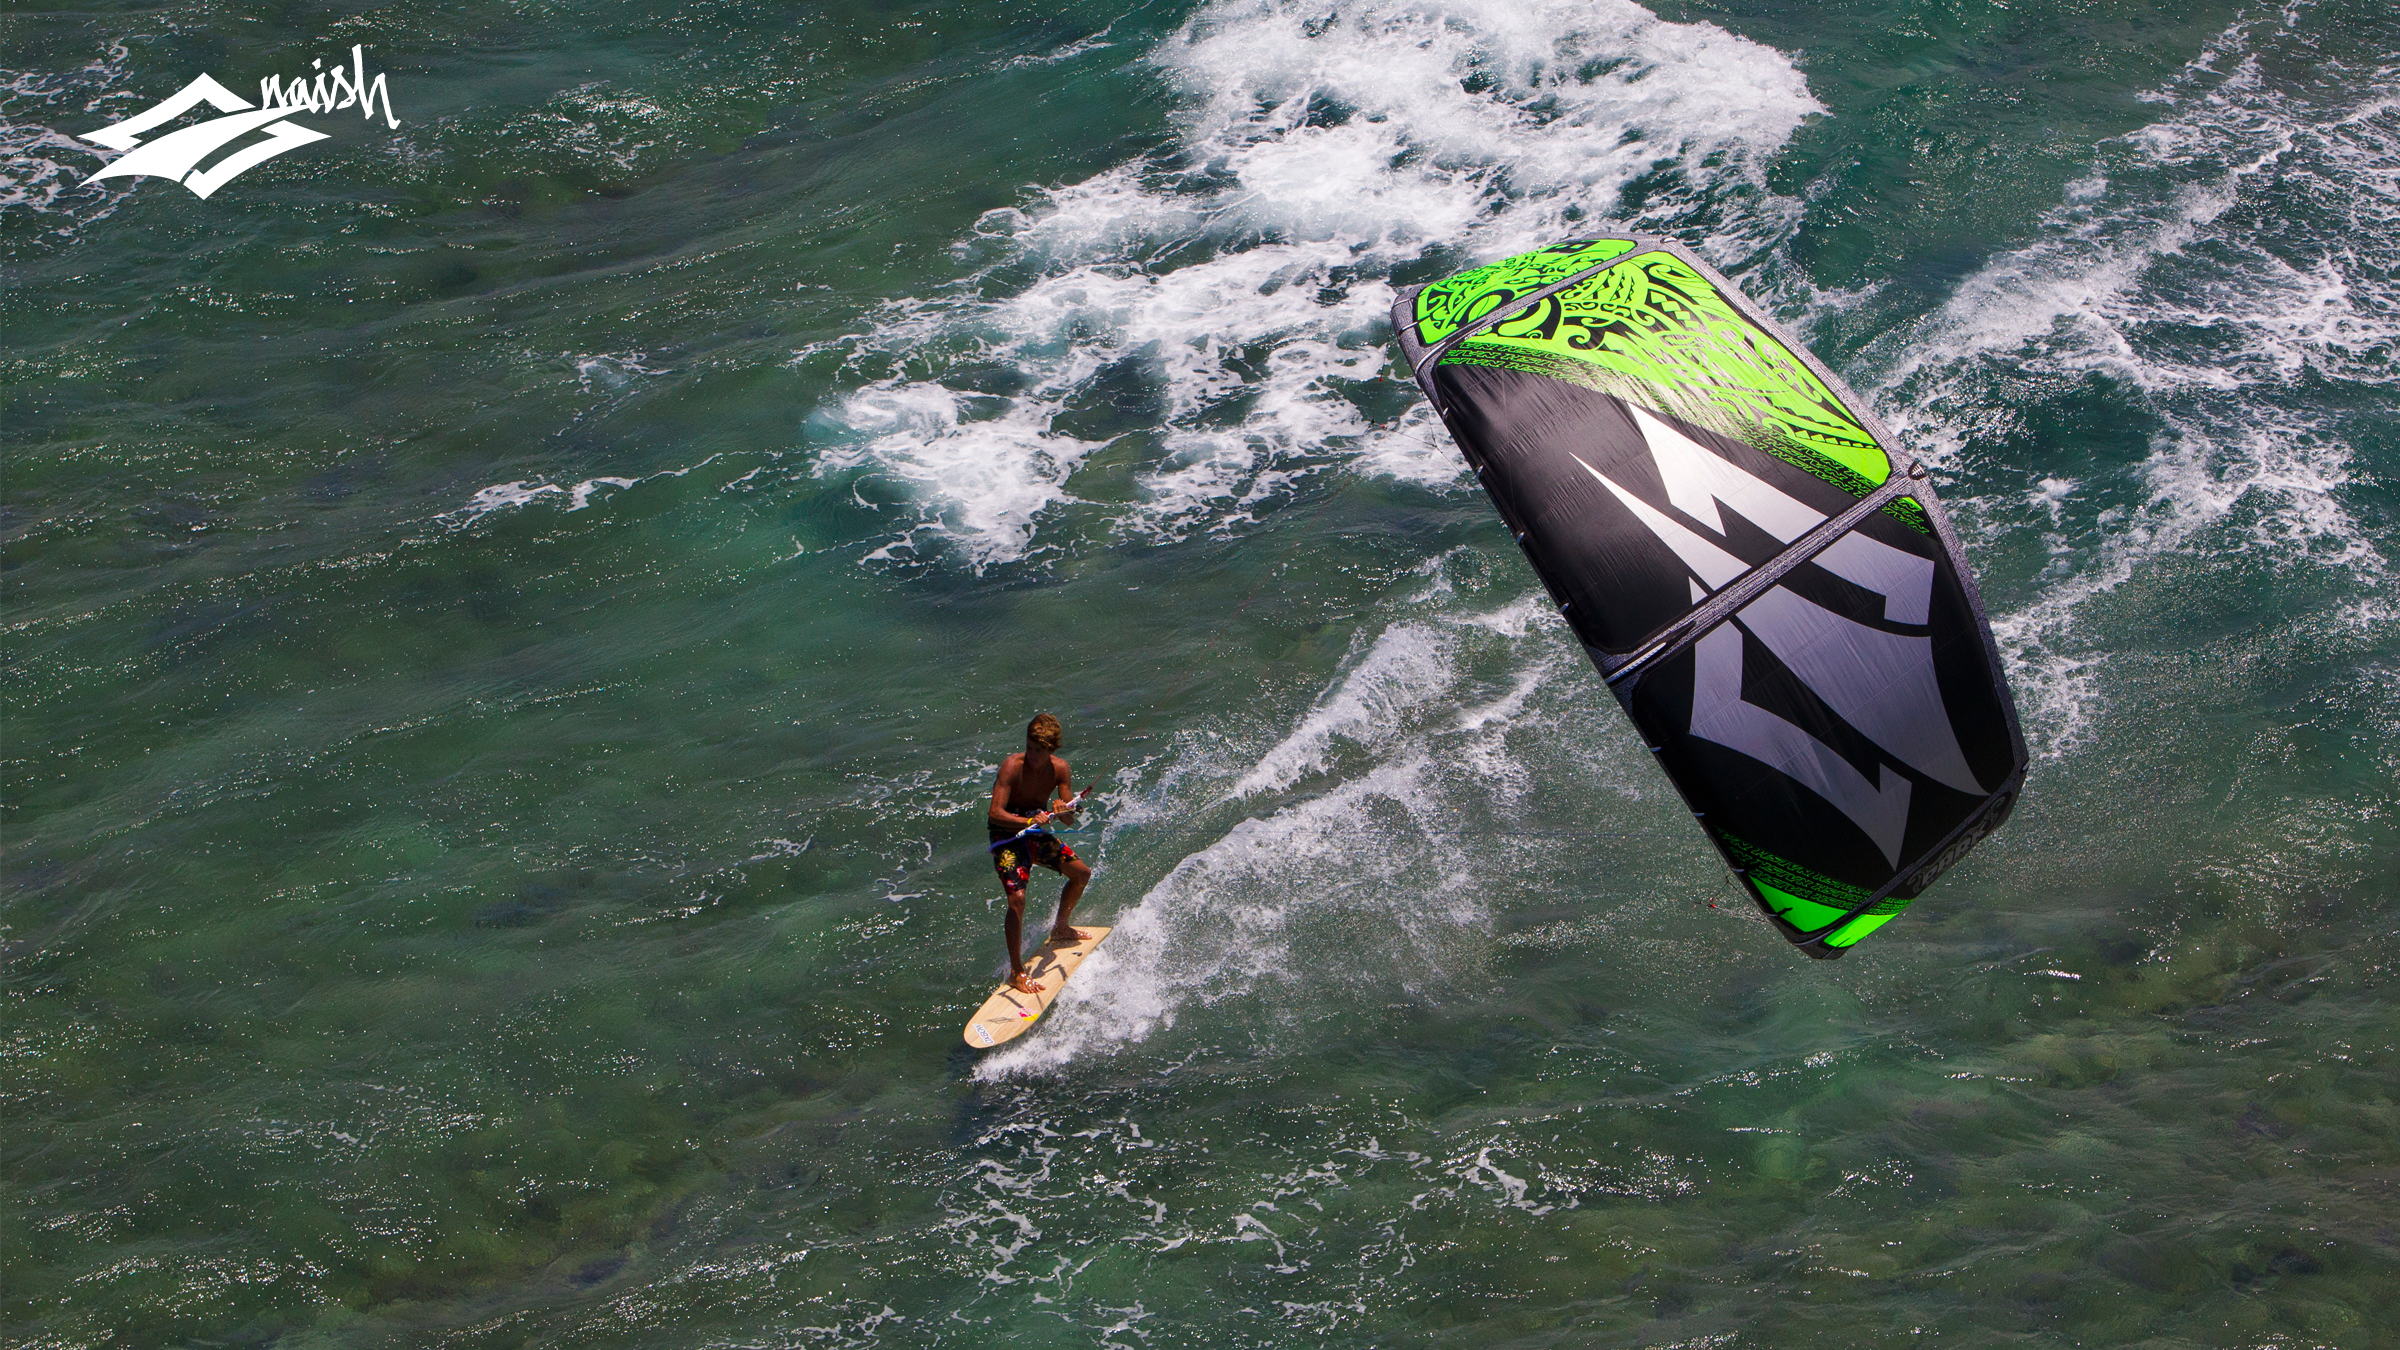 kitesurf wallpaper image - Kai Lenny cruising with the Naish Park kite and Alaia kiteboard off Hawaii - in resolution: High Definition - HD 16:9 2400 X 1350